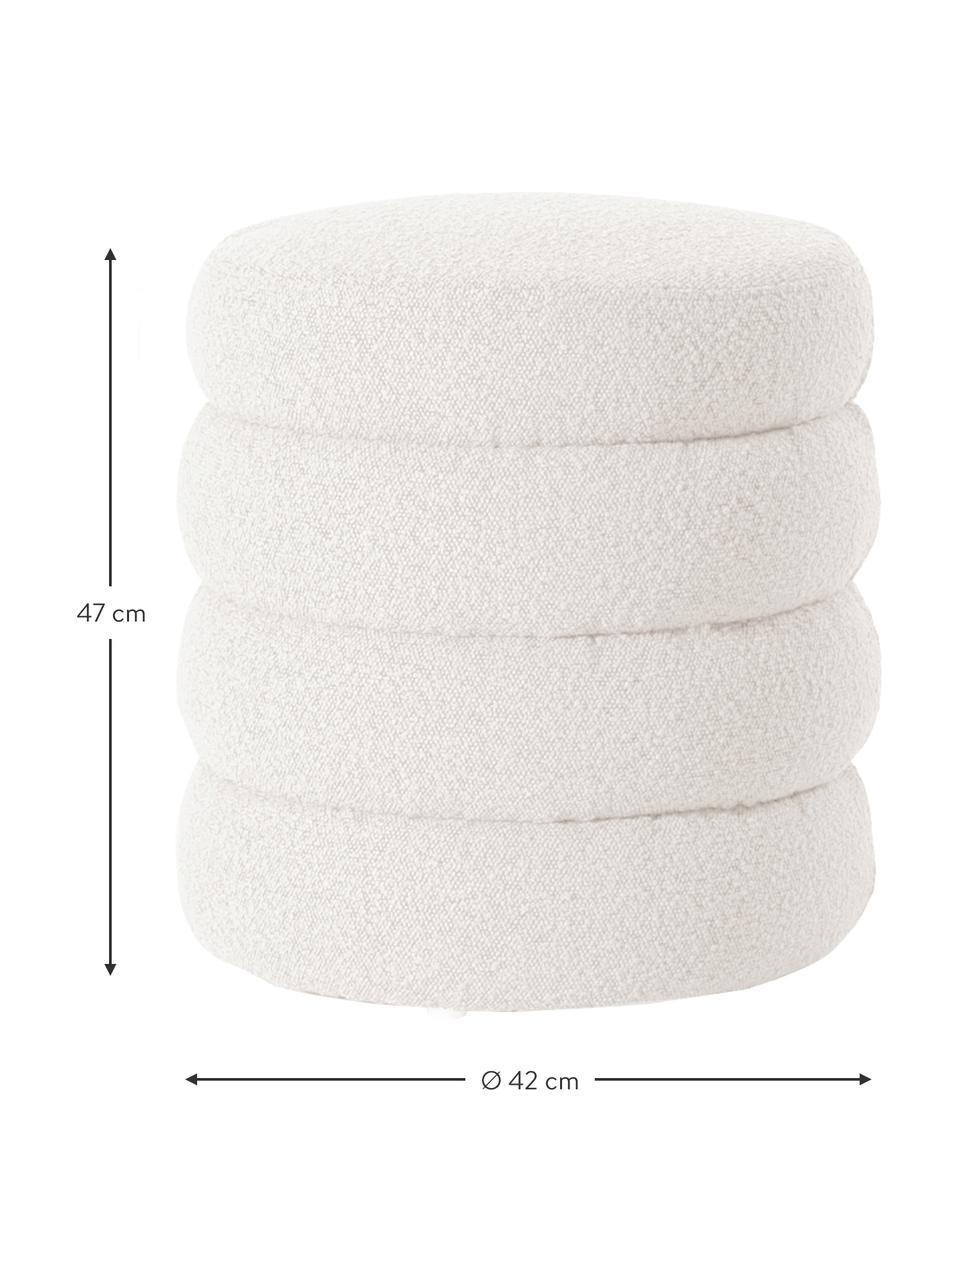 Bouclé-Hocker Alto in Cremeweiß, Bezug: Bouclé (100% Polyester) D, Gestell: Massives Kiefernholz, Spe, Bouclé Cremeweiß, Ø 42 x H 47 cm